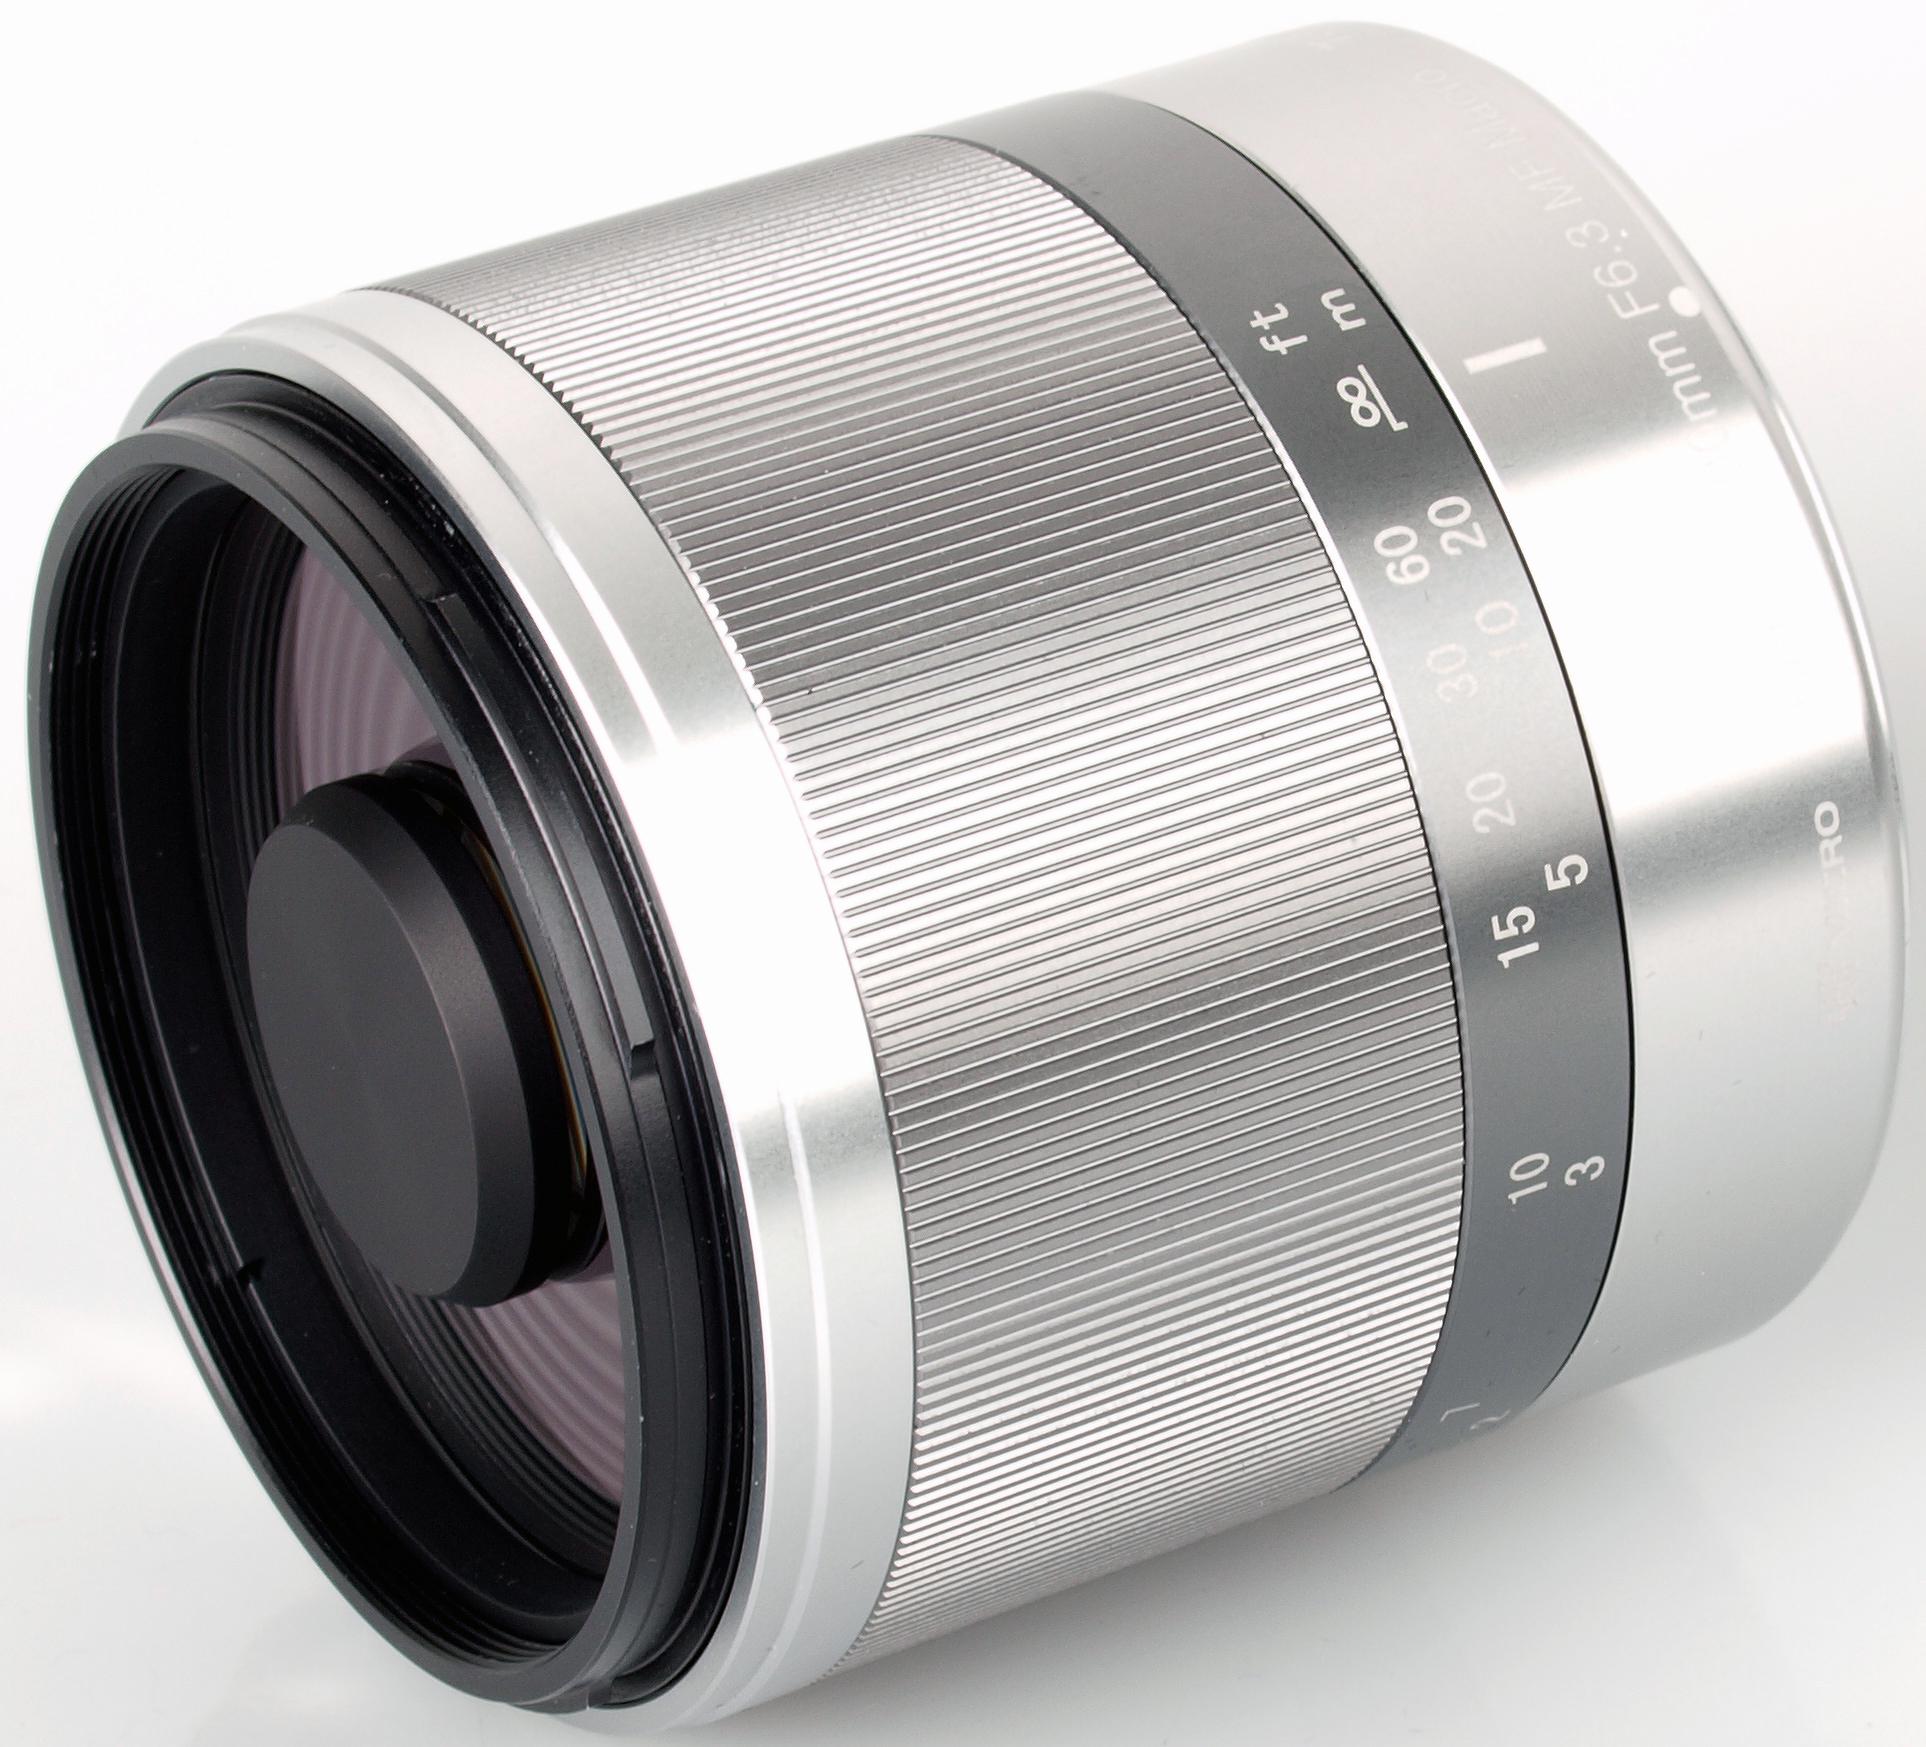 Nikon 500mm f/8 Reflex-NIKKOR - Ken Rockwell